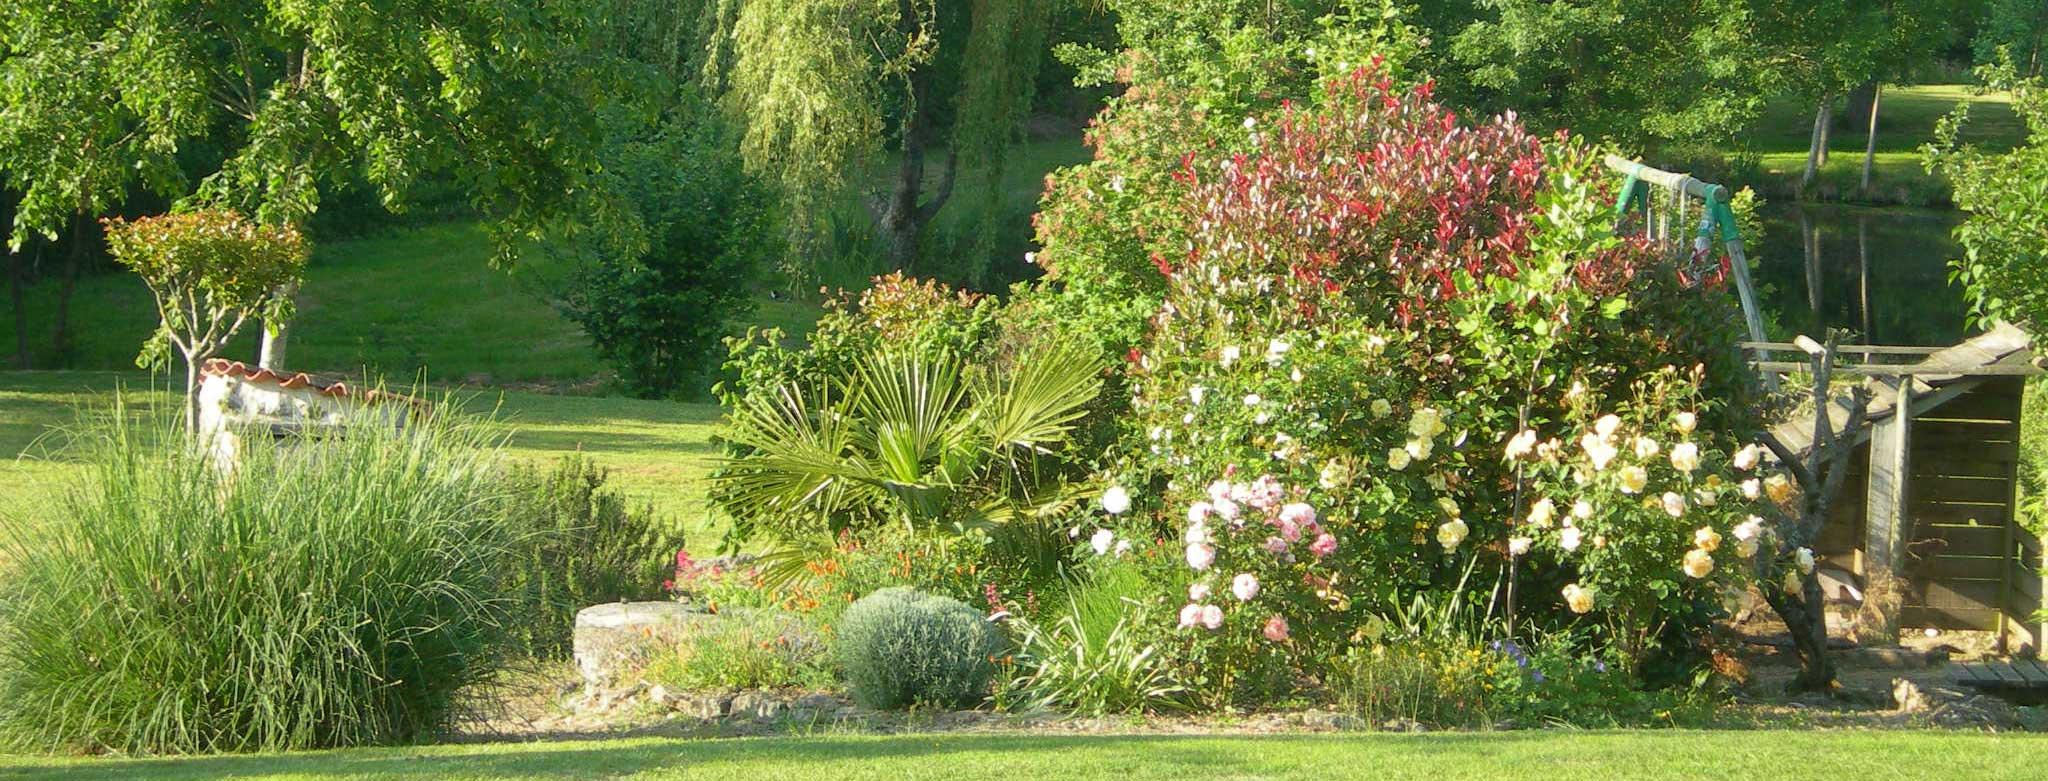 jardin_paysage-2